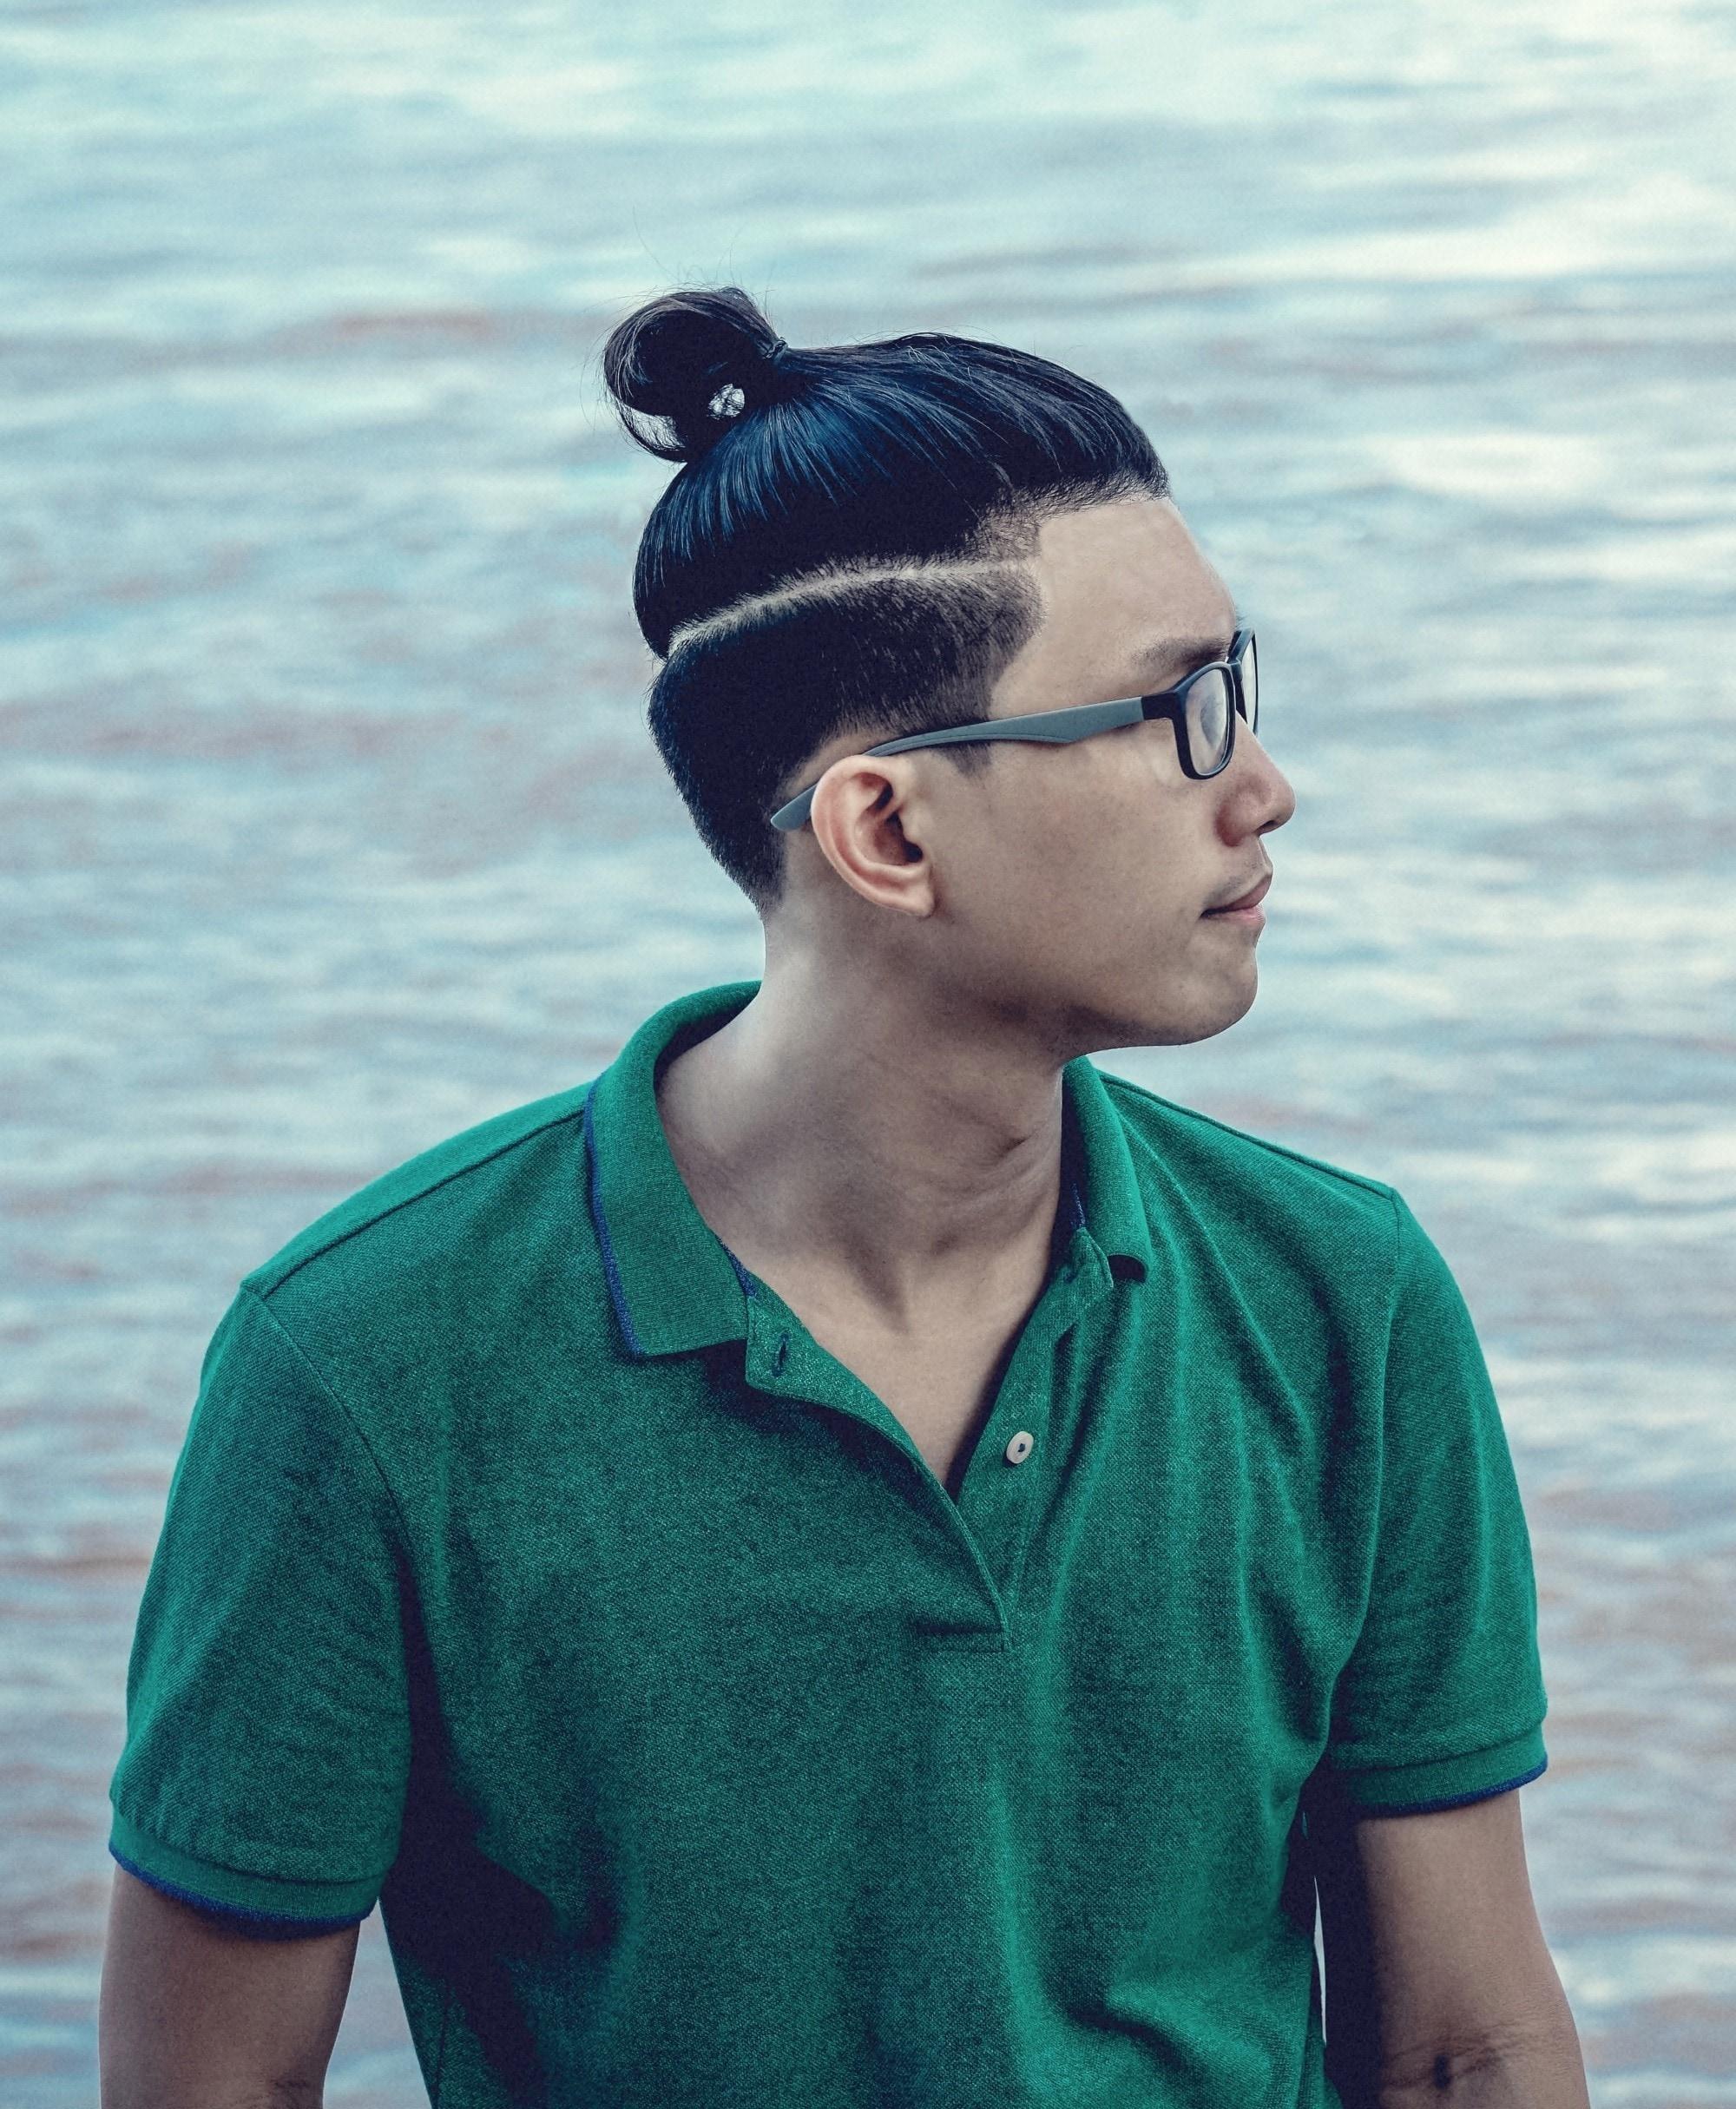 Asian man bun: Asian man with black hair in a half up bun wearing a green shirt by the sea